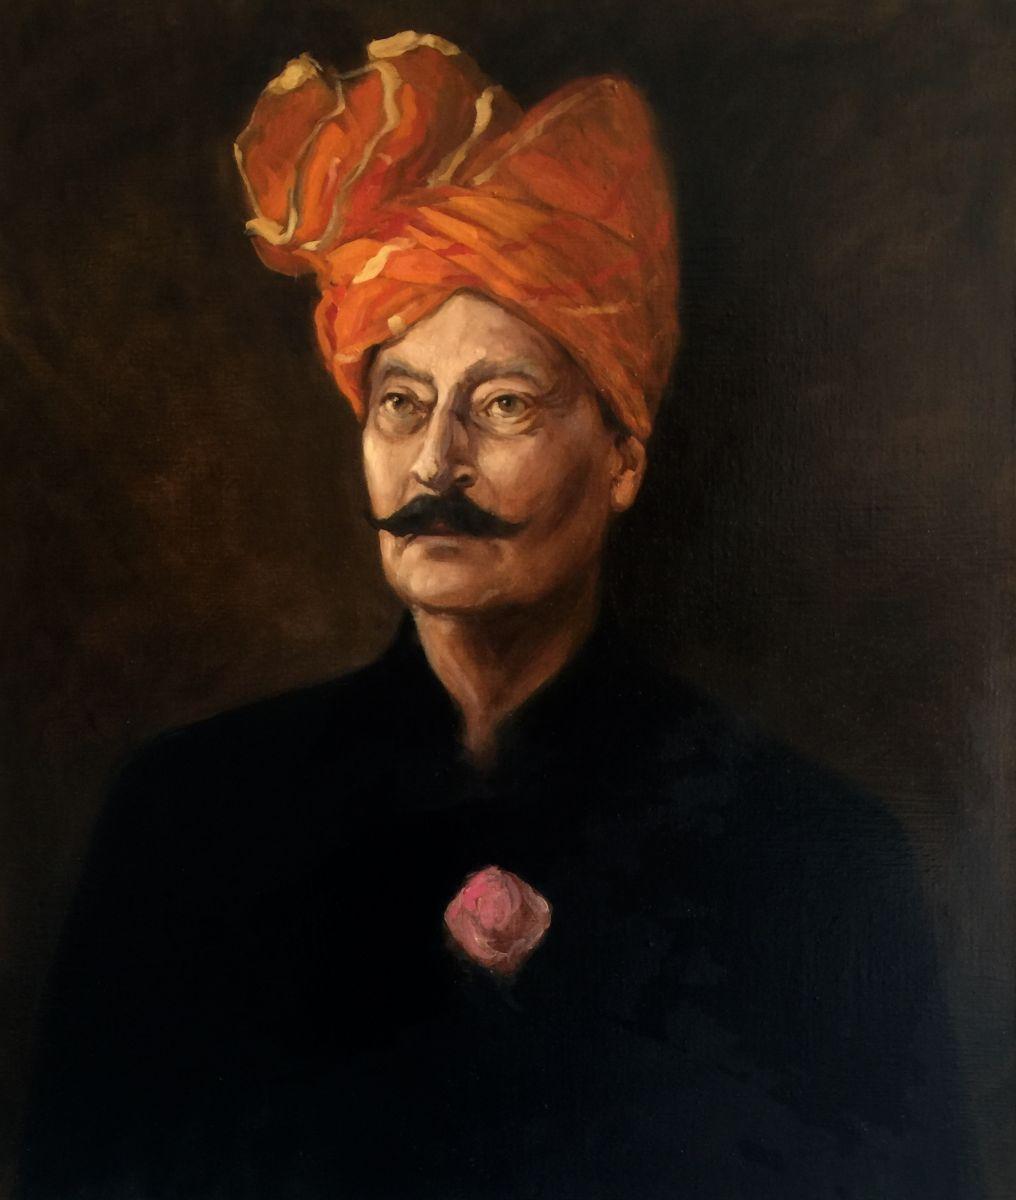 Portrait Study of a Man in a Turban